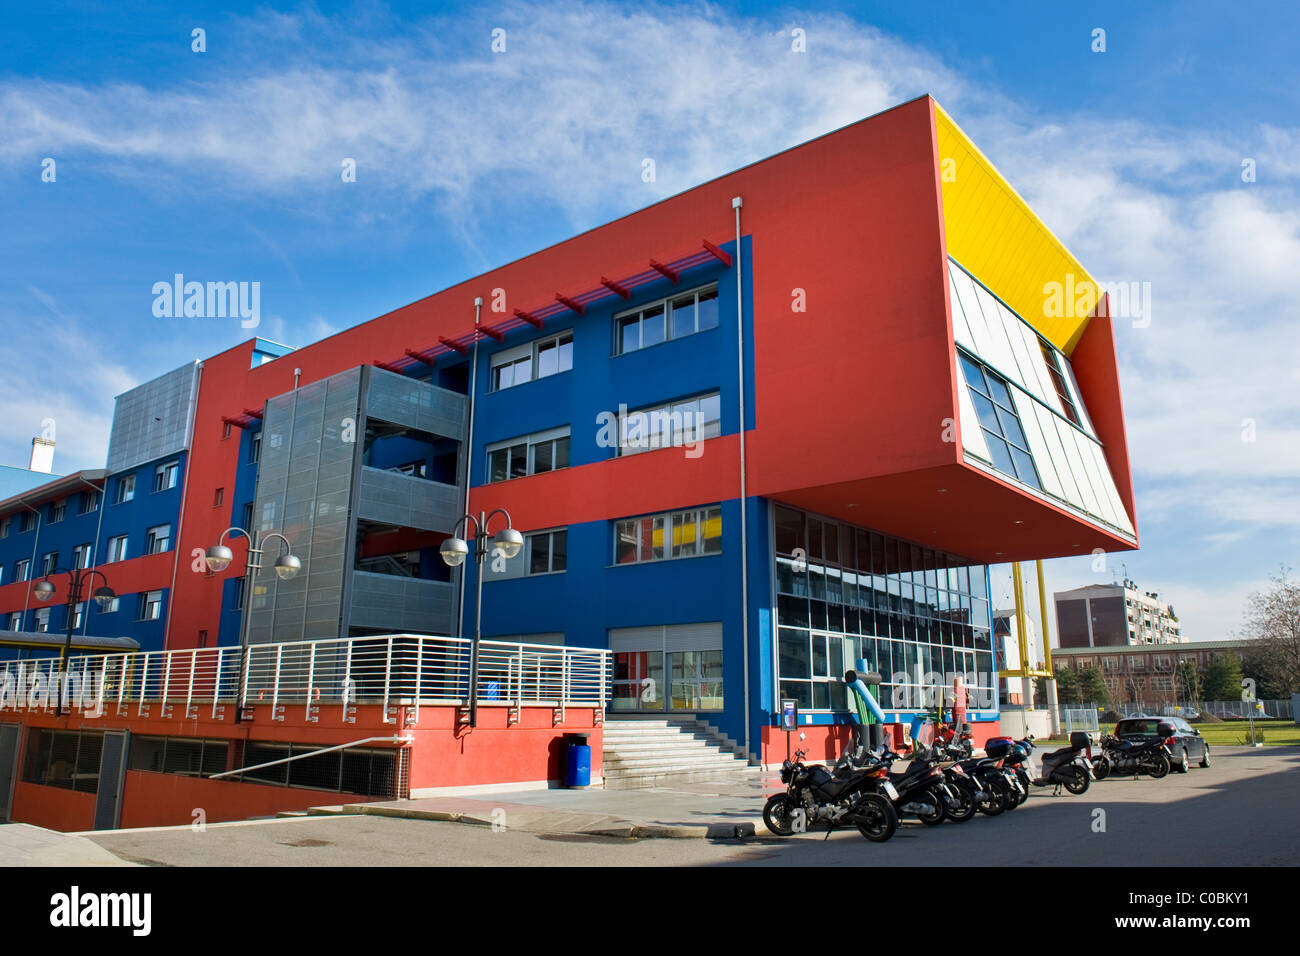 Faculty of design politecnico campus bovisa milan italy for Politecnico milano design della moda